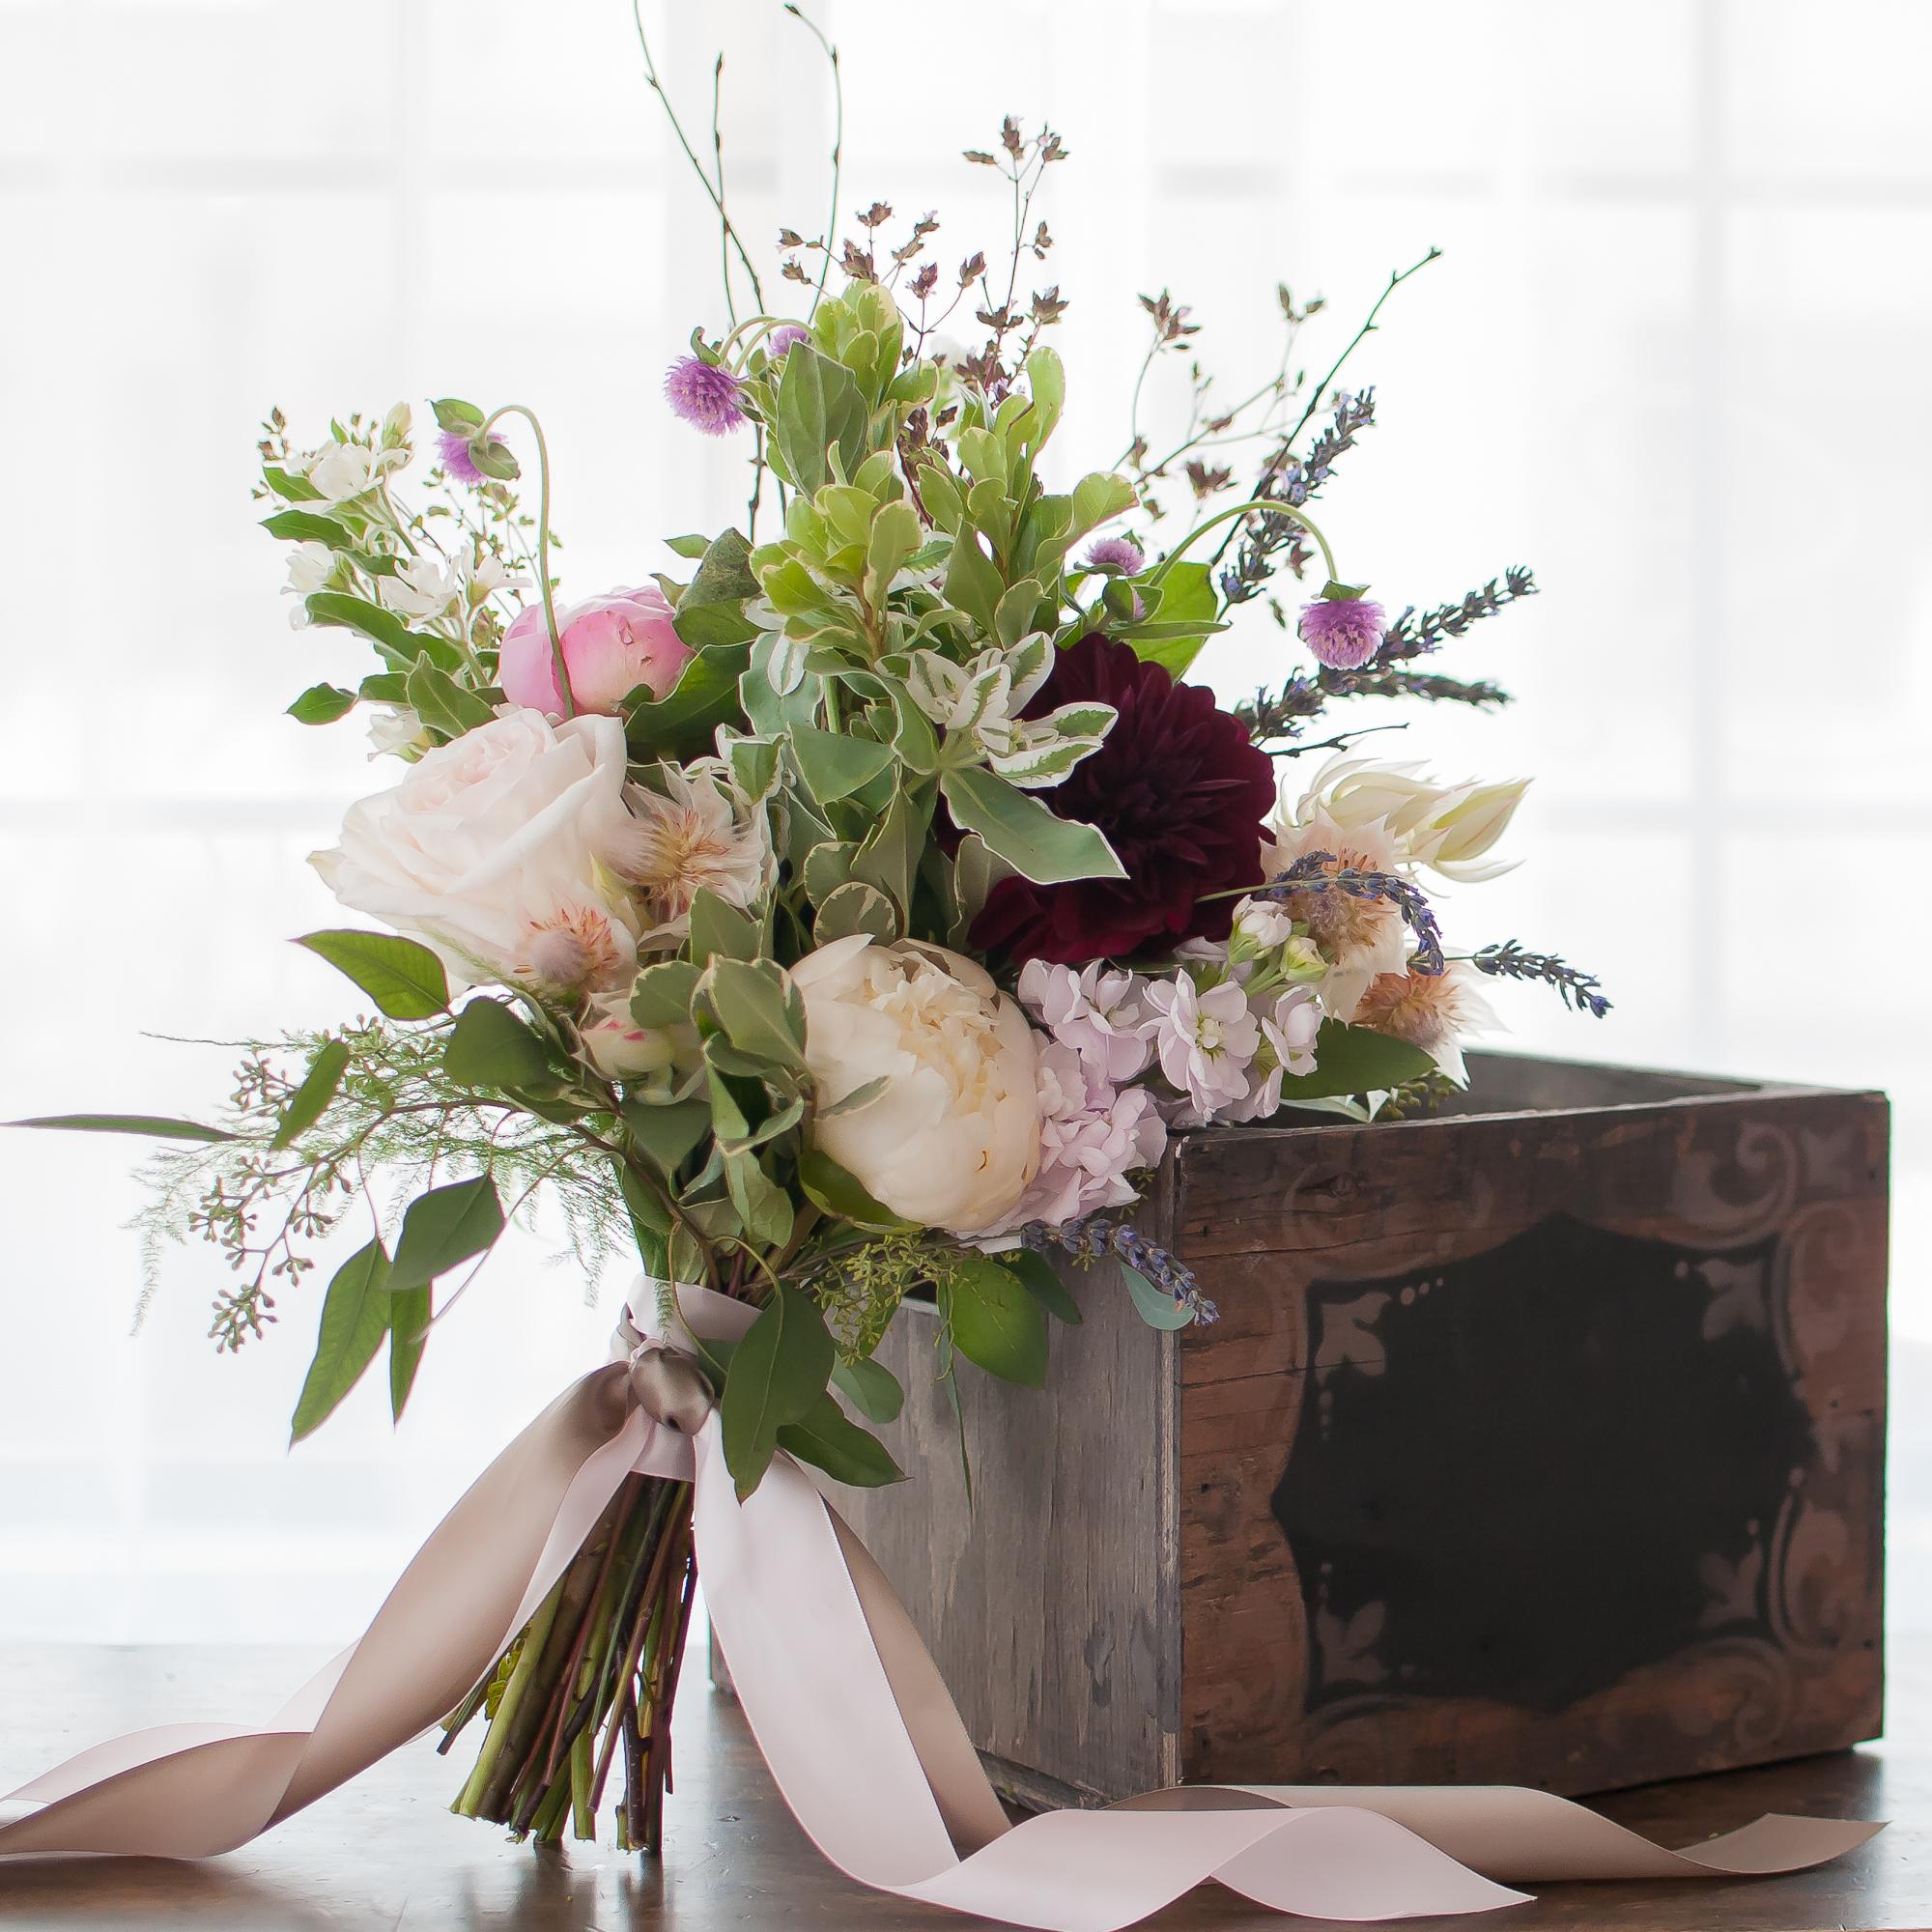 072315 Bouquet arrangements_7723.jpg